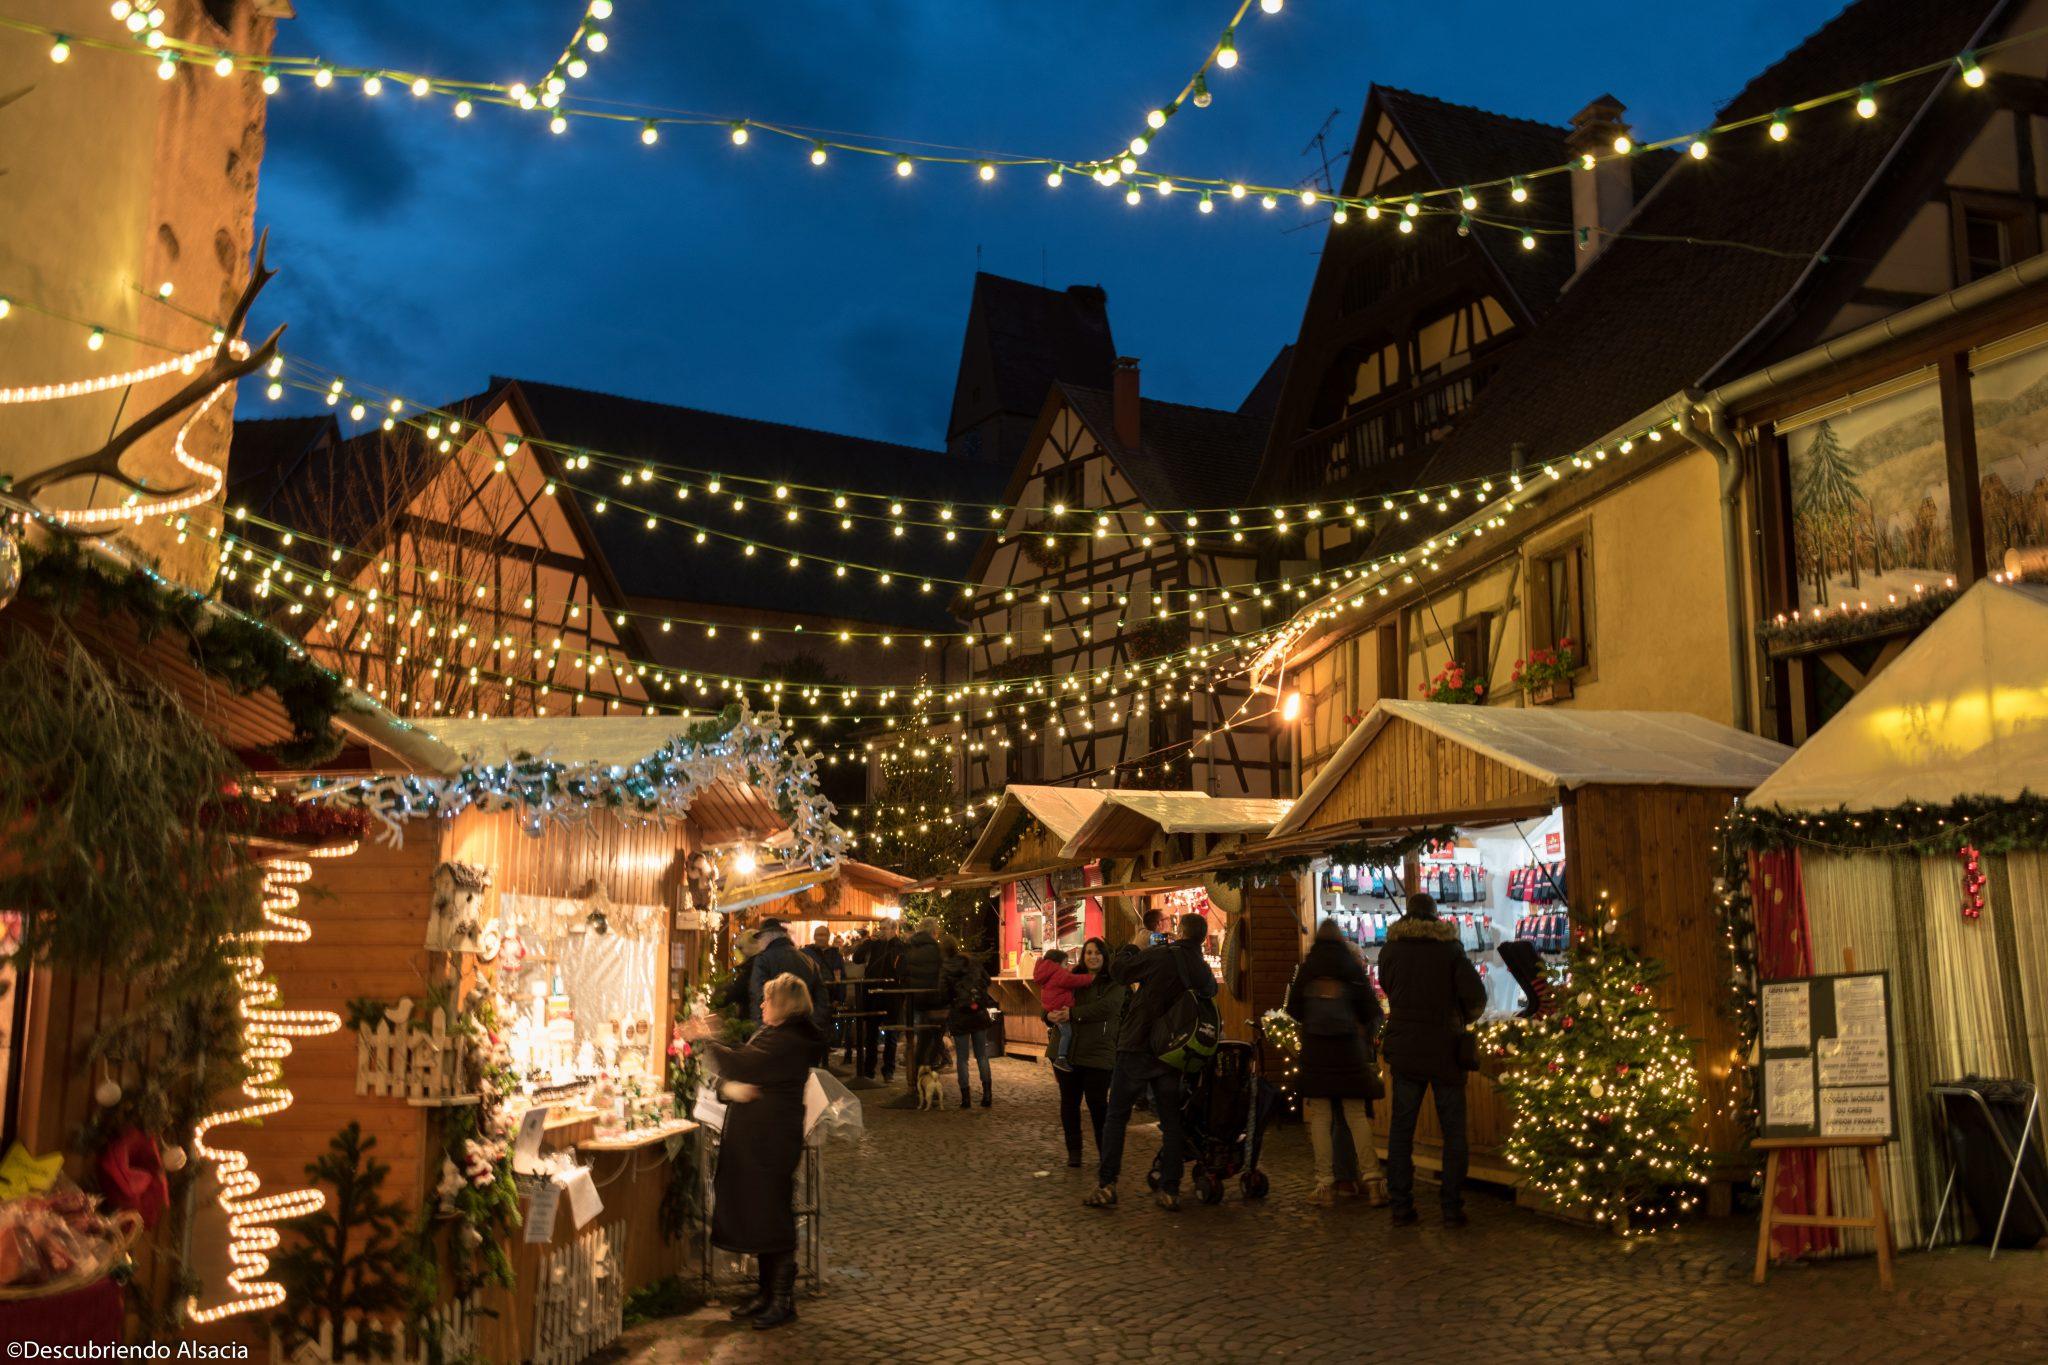 mercado navidad Eguisheim 2018